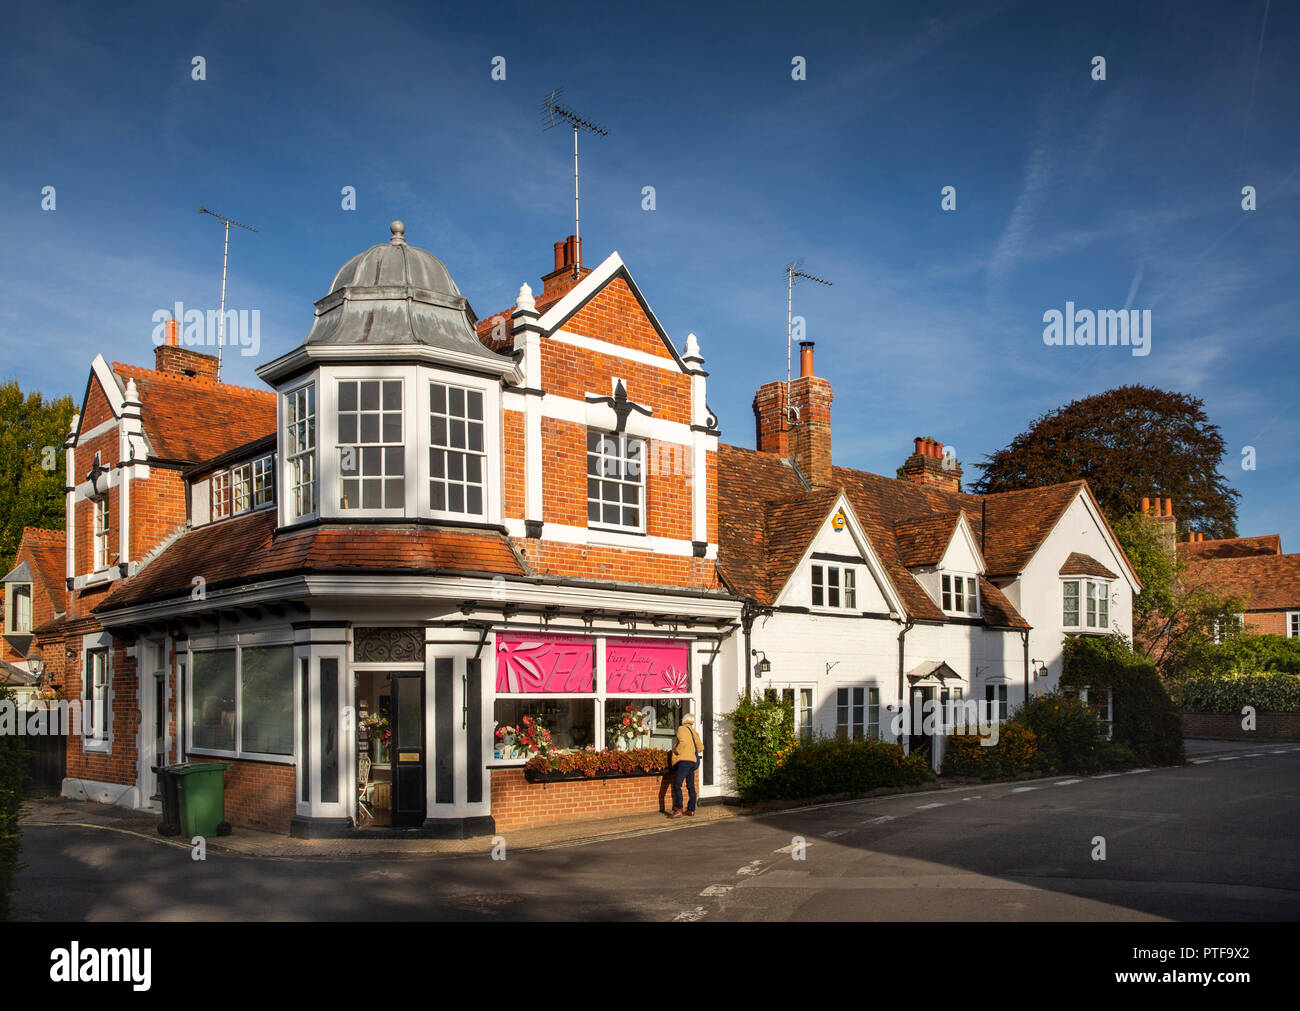 England, Berkshire, Goring on Thames, Manor Road, Ferry Lane Florist's shop in Edwardian building Stock Photo